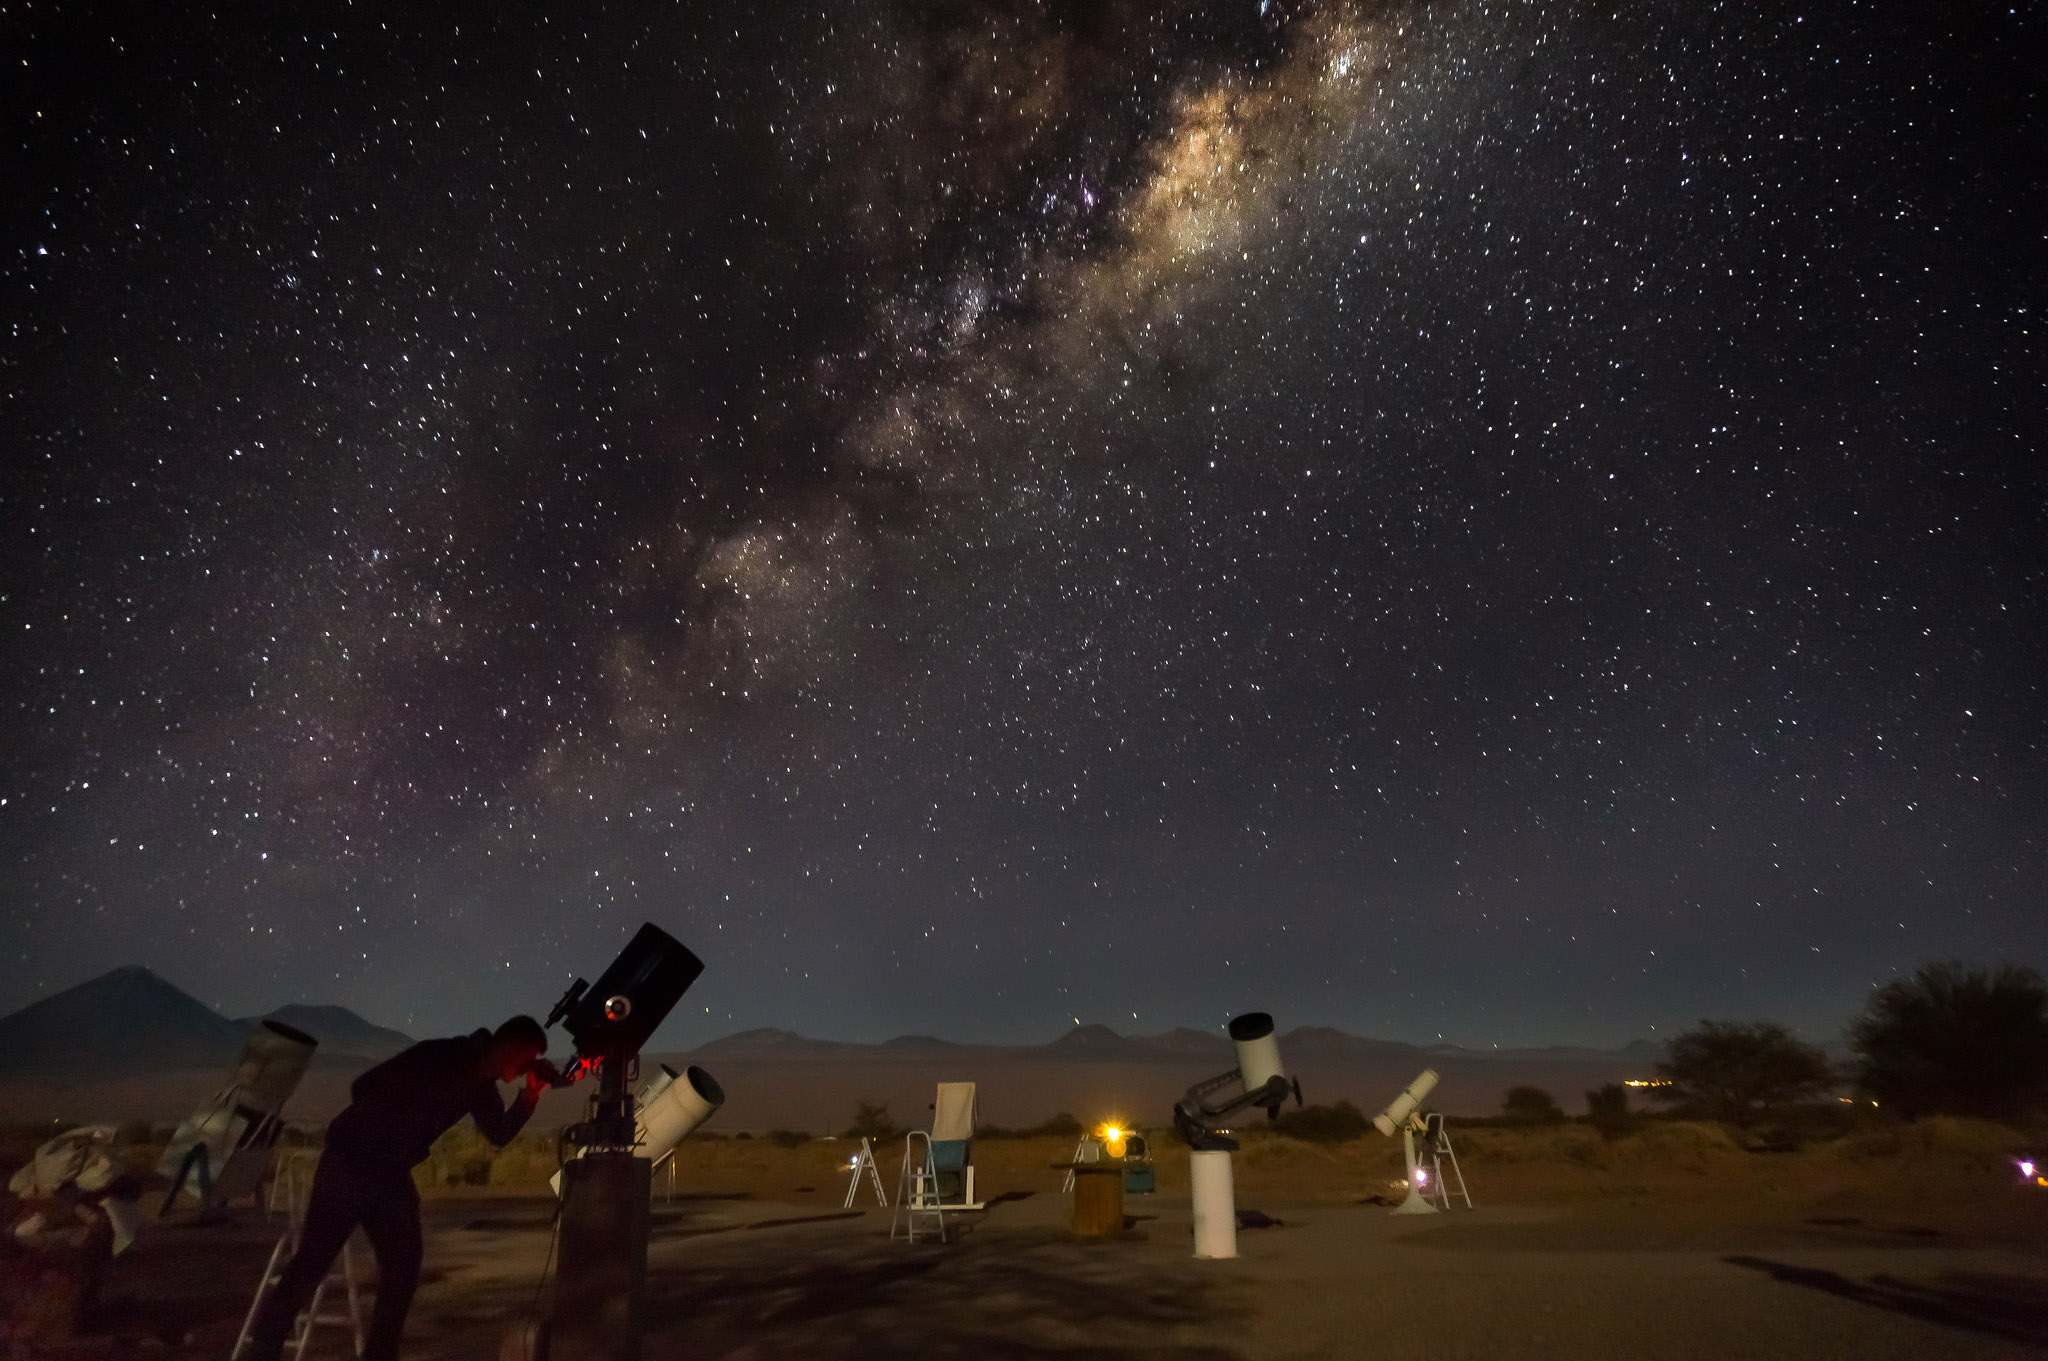 Наблюдение за звездами в пустыне Атакама